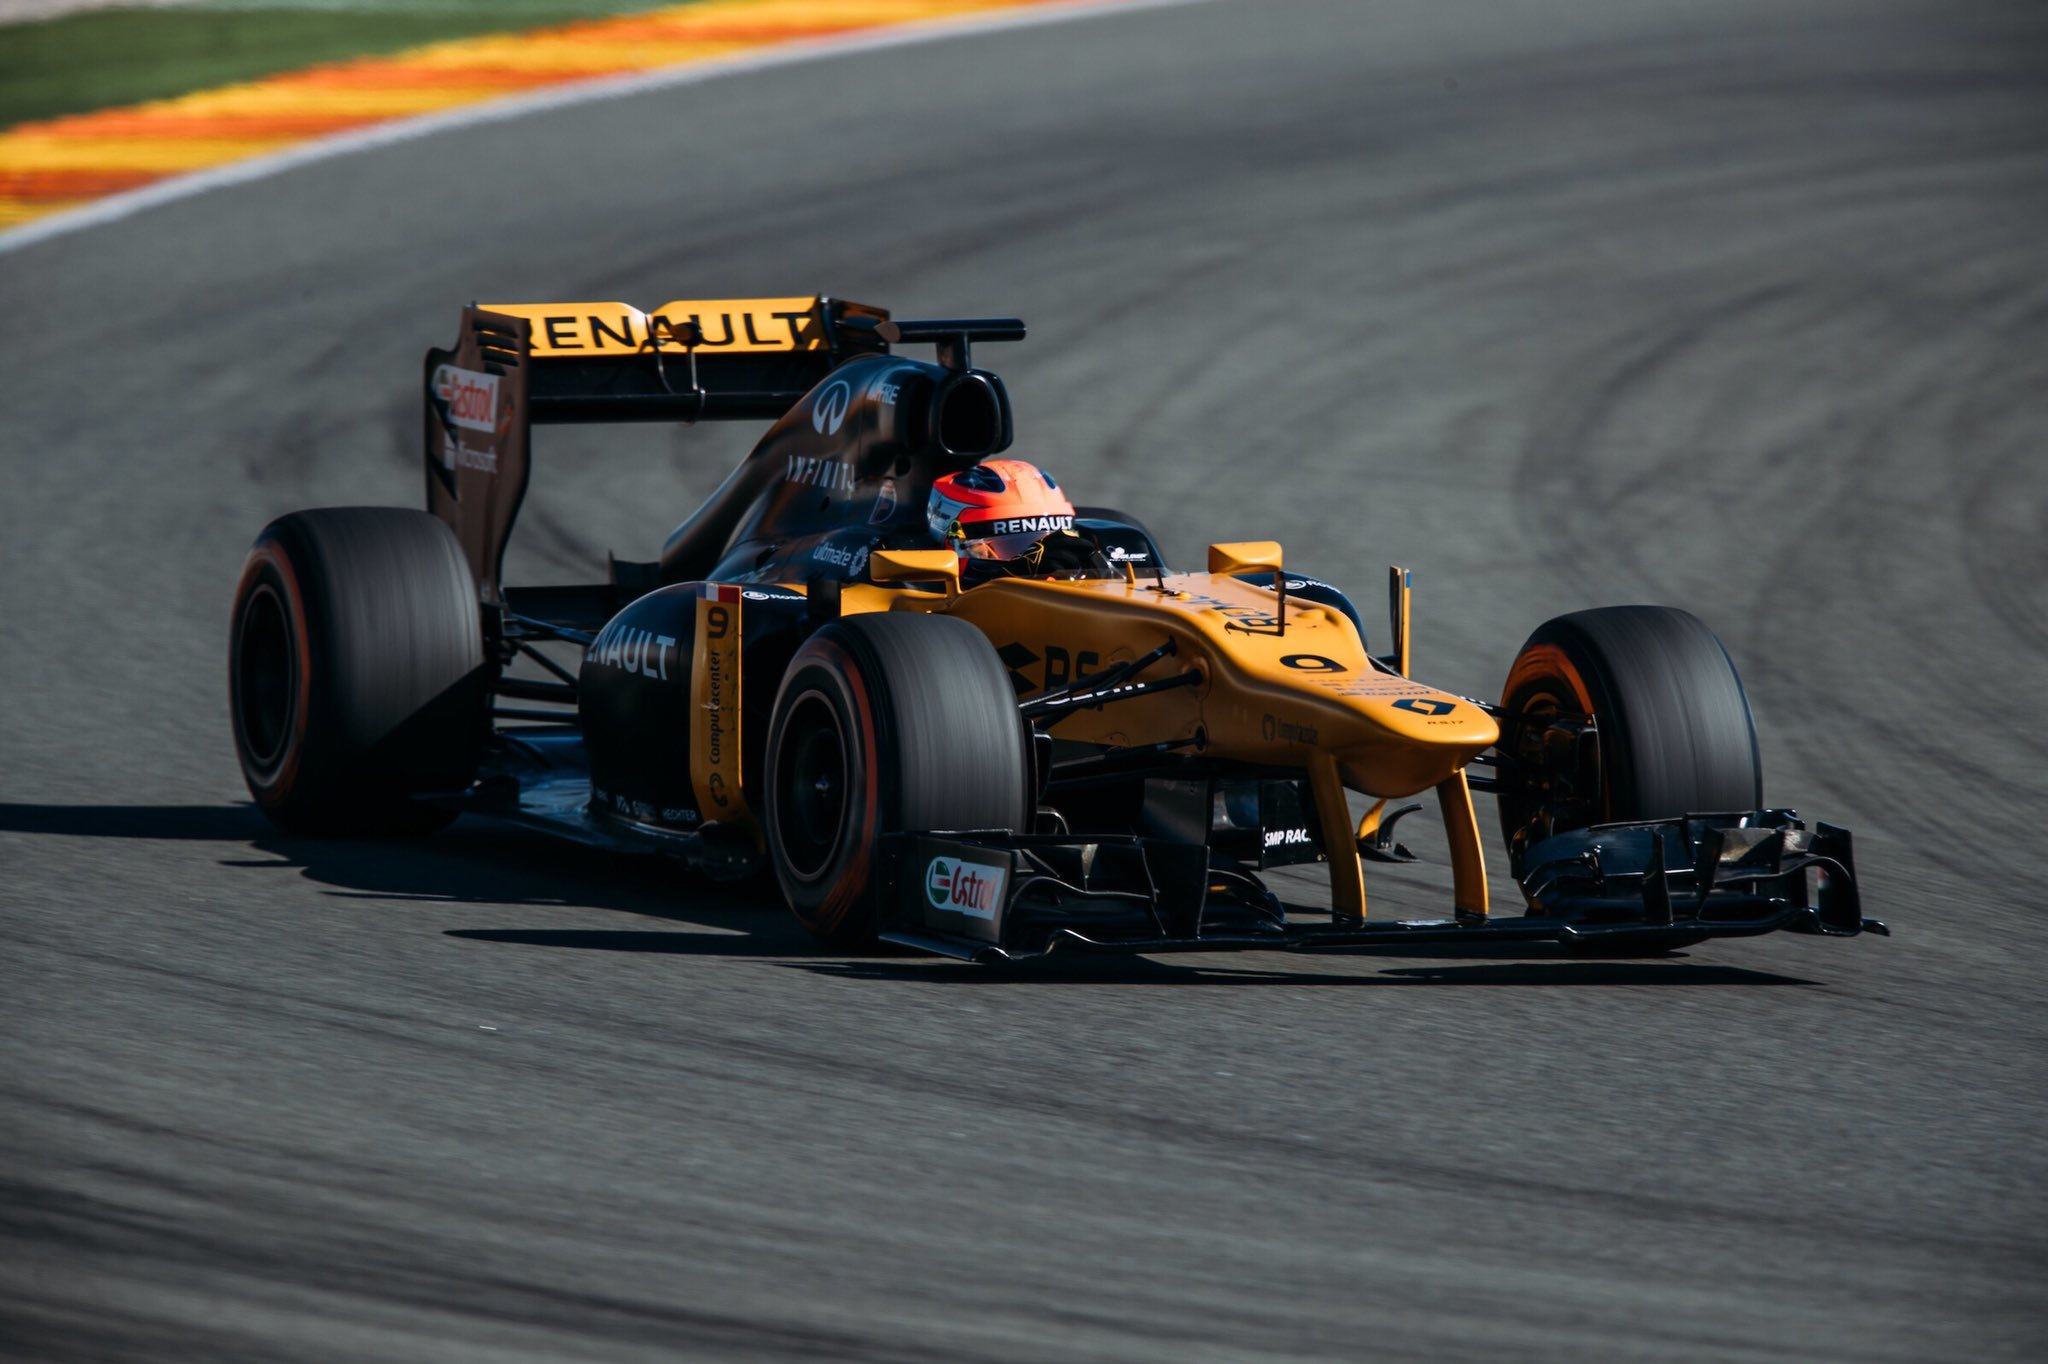 Robert Kubica 2017 Valencia Test E20